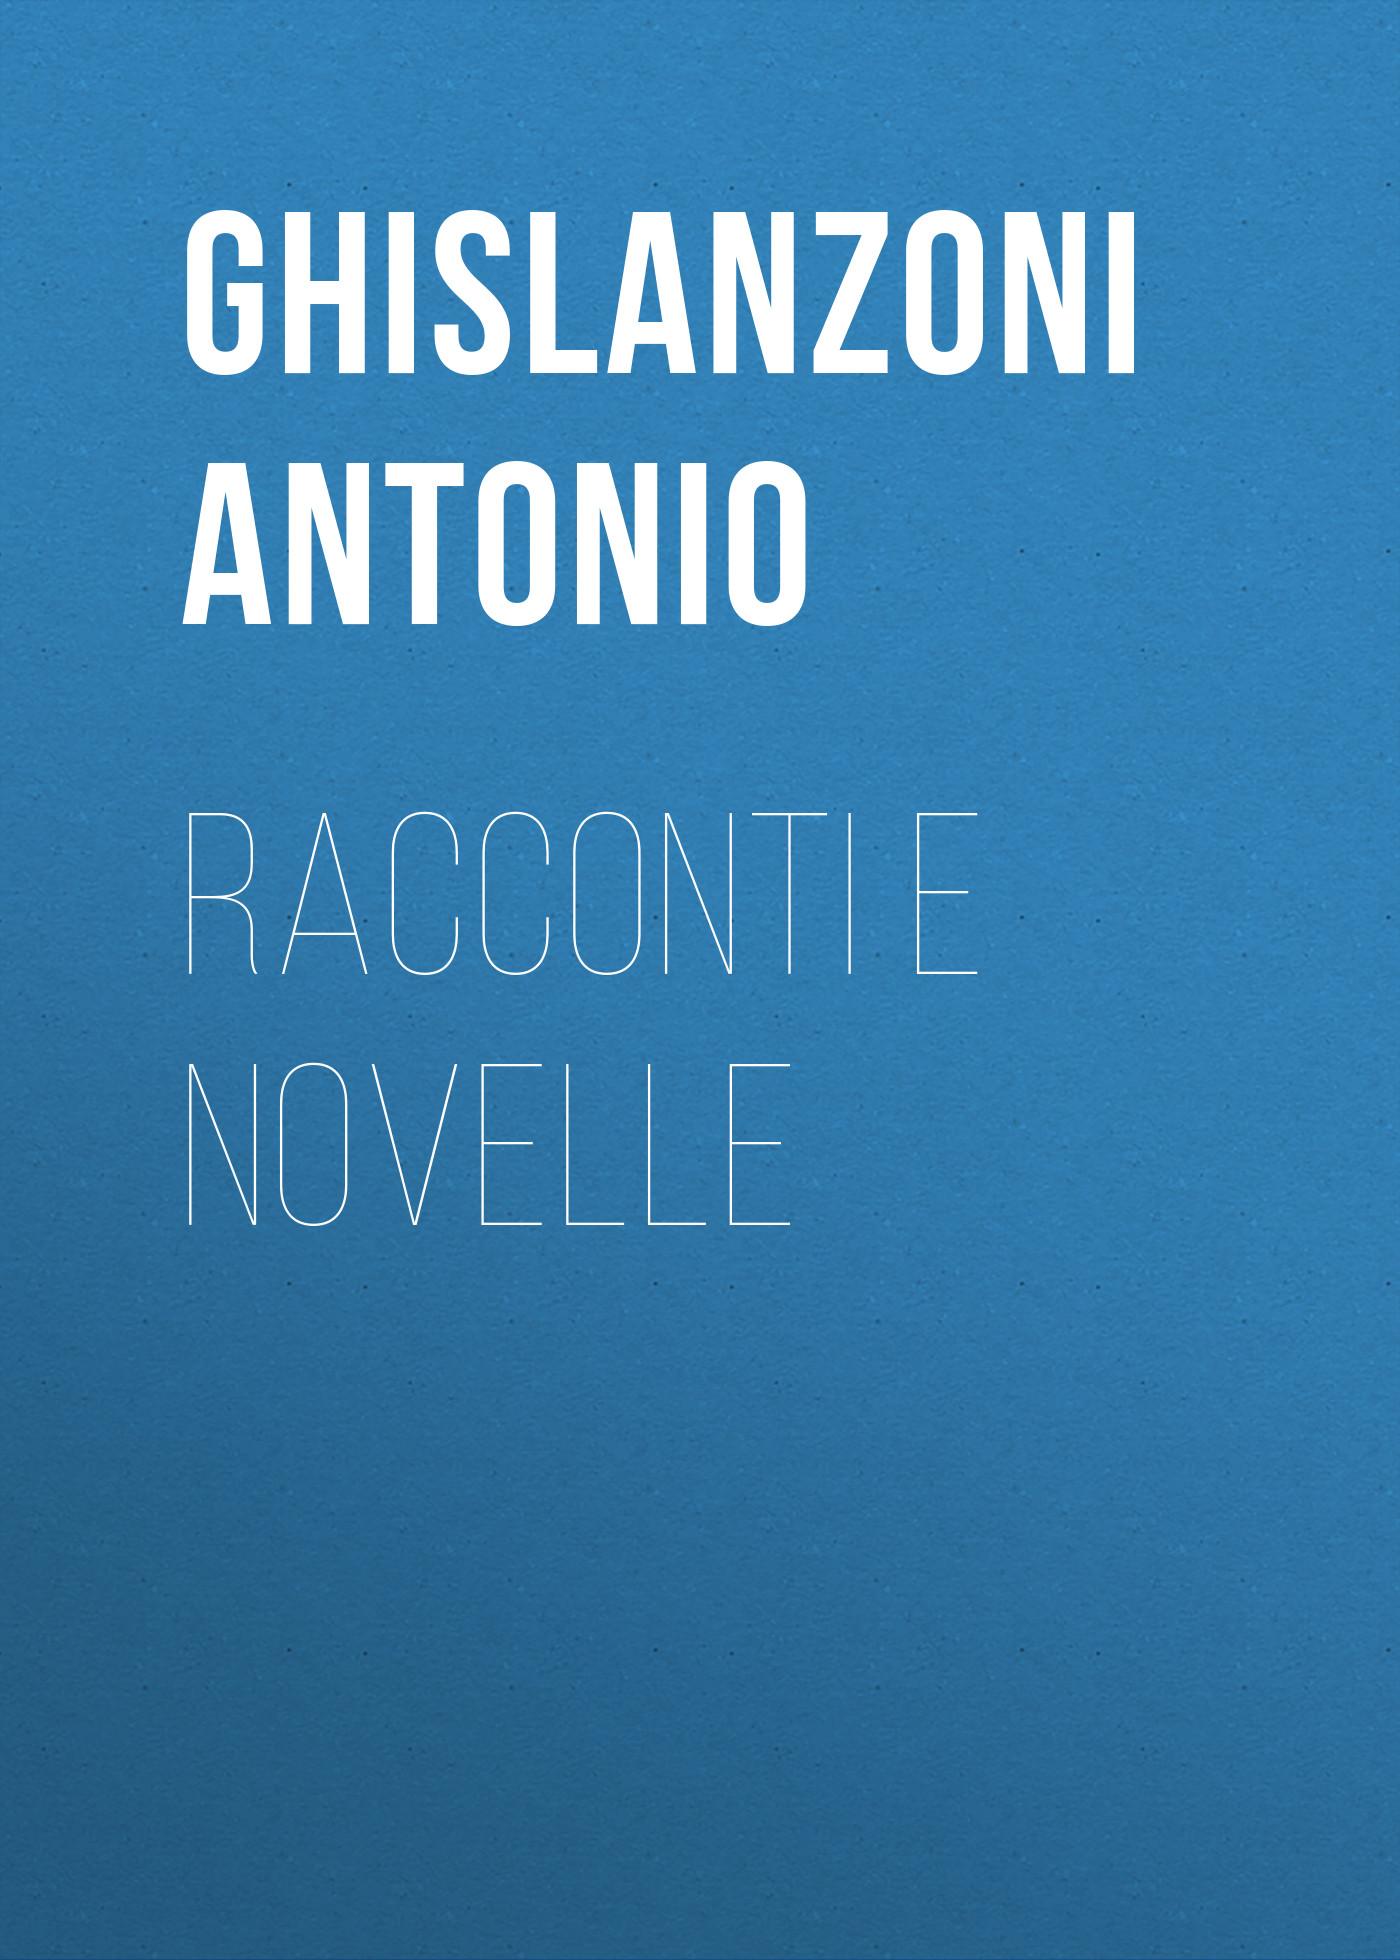 Ghislanzoni Antonio Racconti e novelle ghislanzoni antonio racconti e novelle